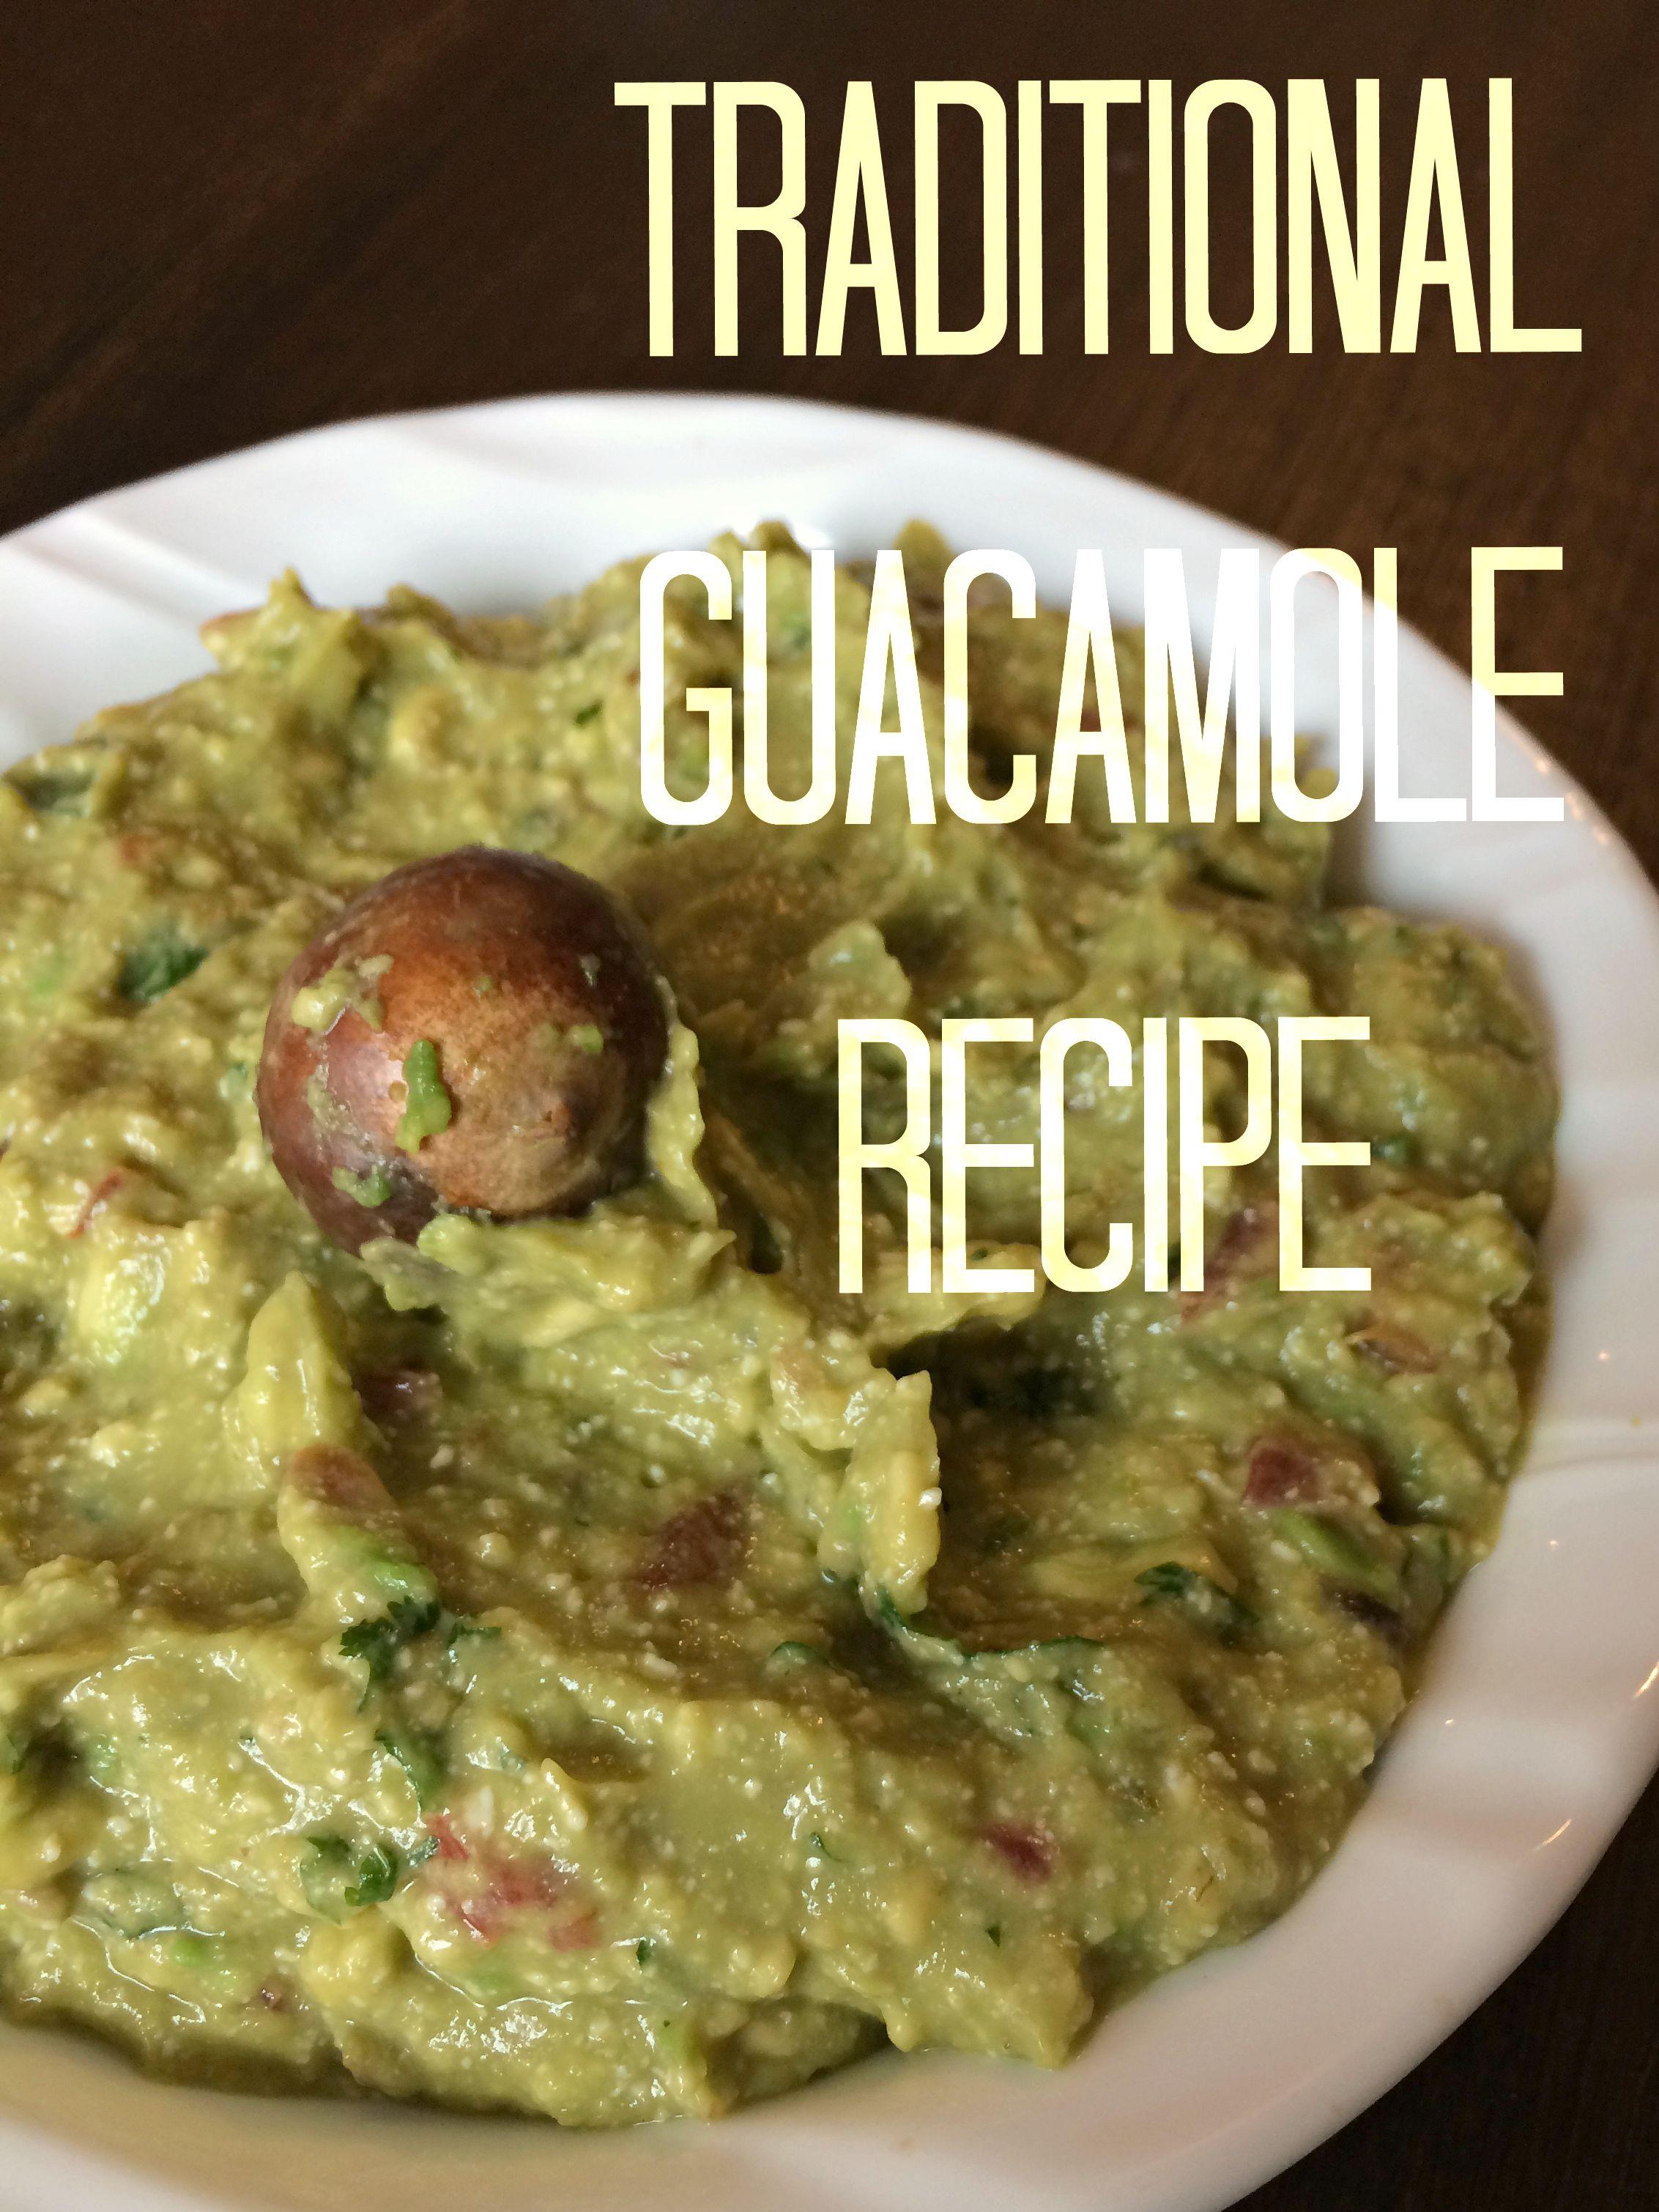 authentic traditional guacamole recipe